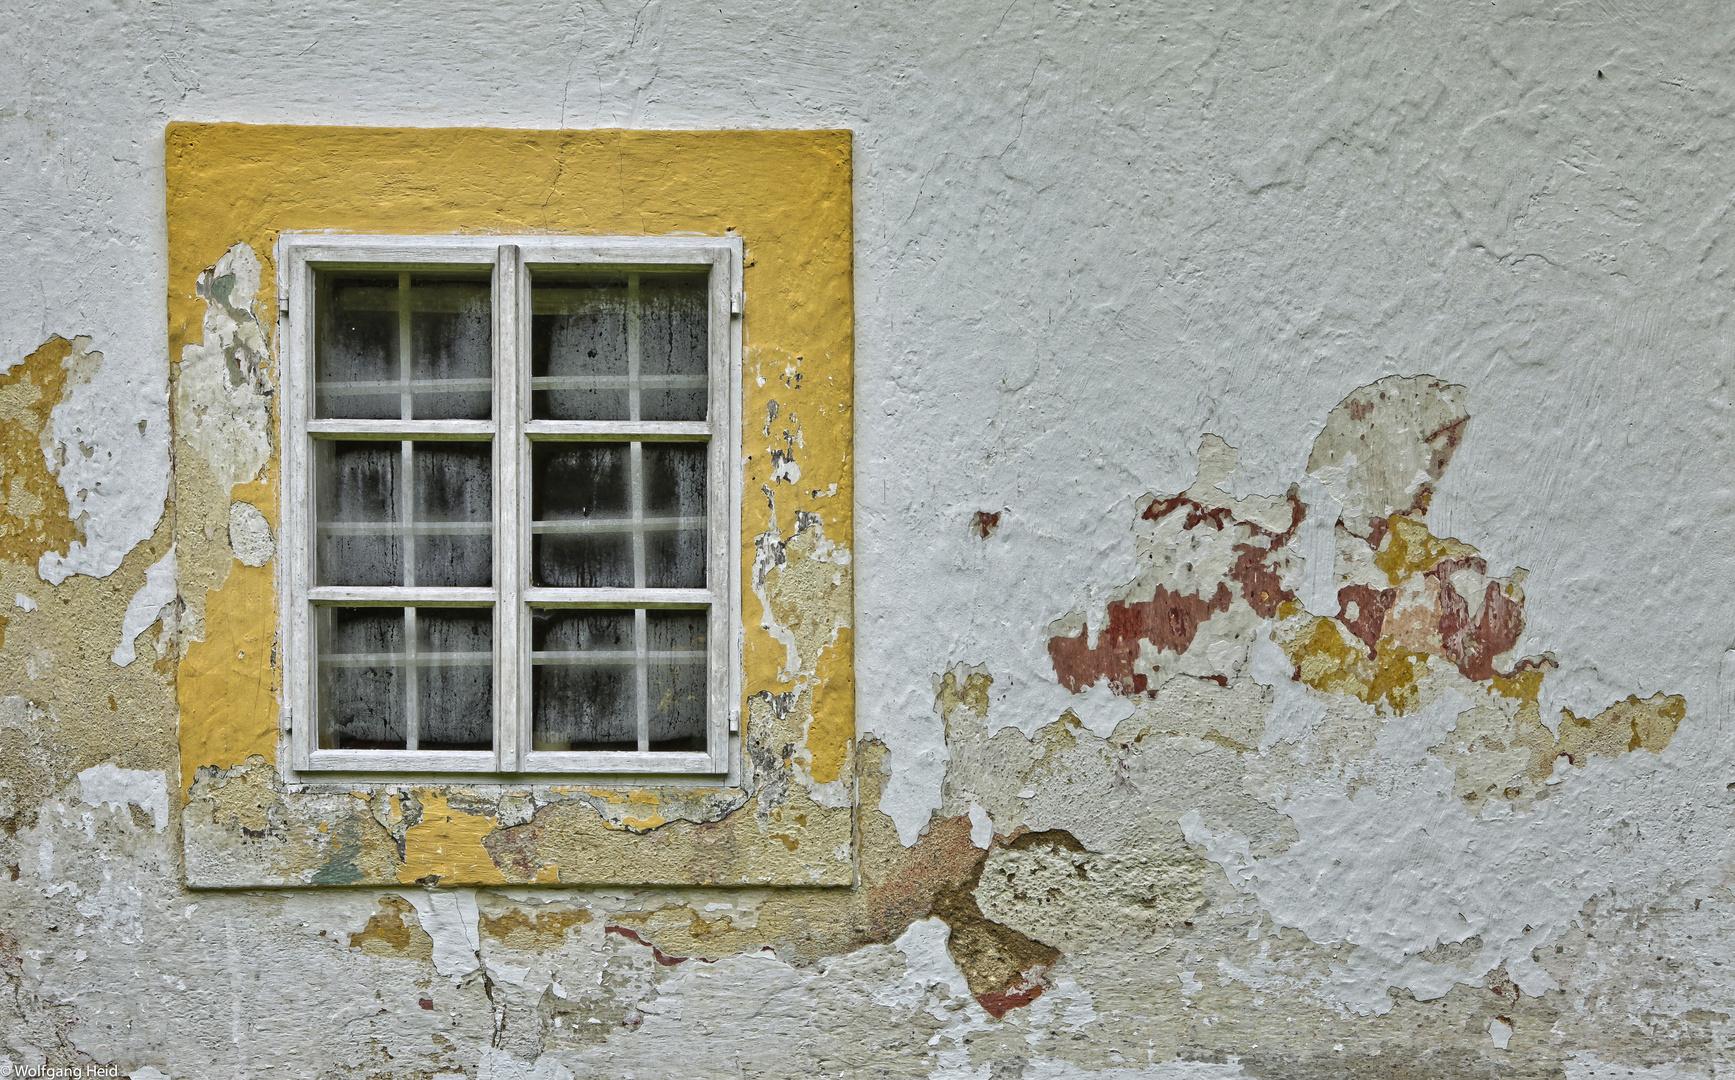 Marode Fassade